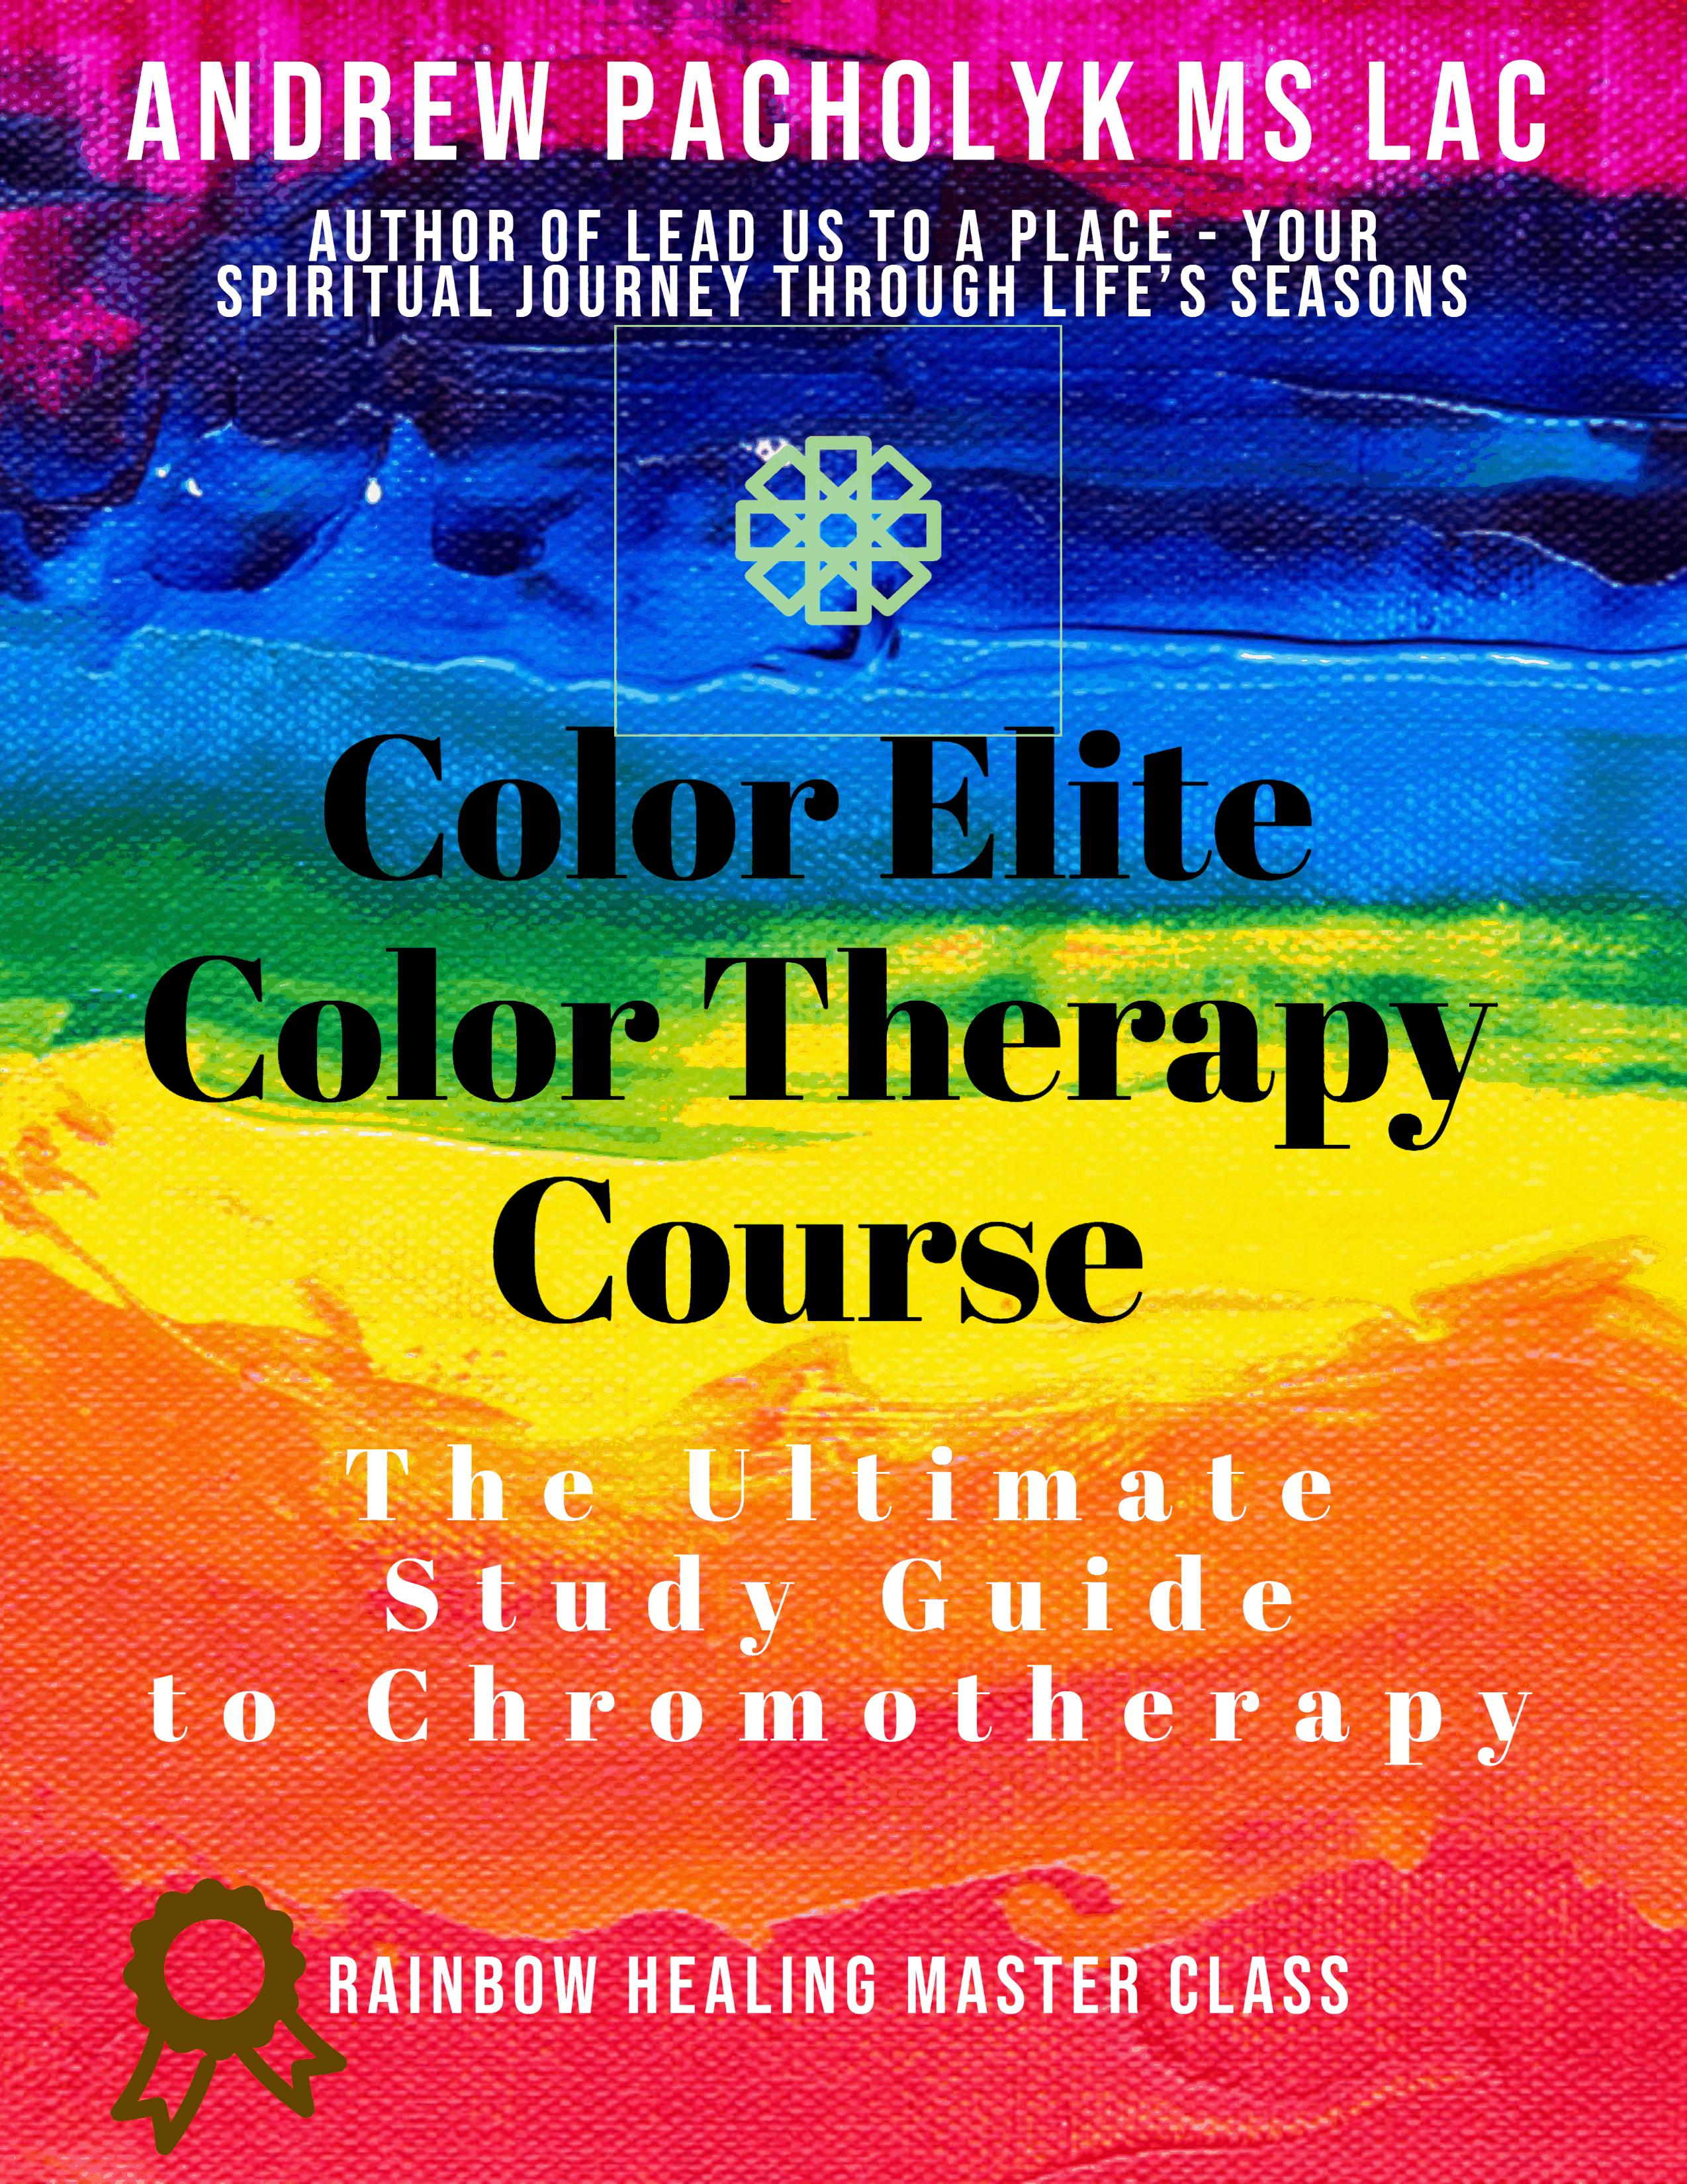 Color Elite Color Therapy Course